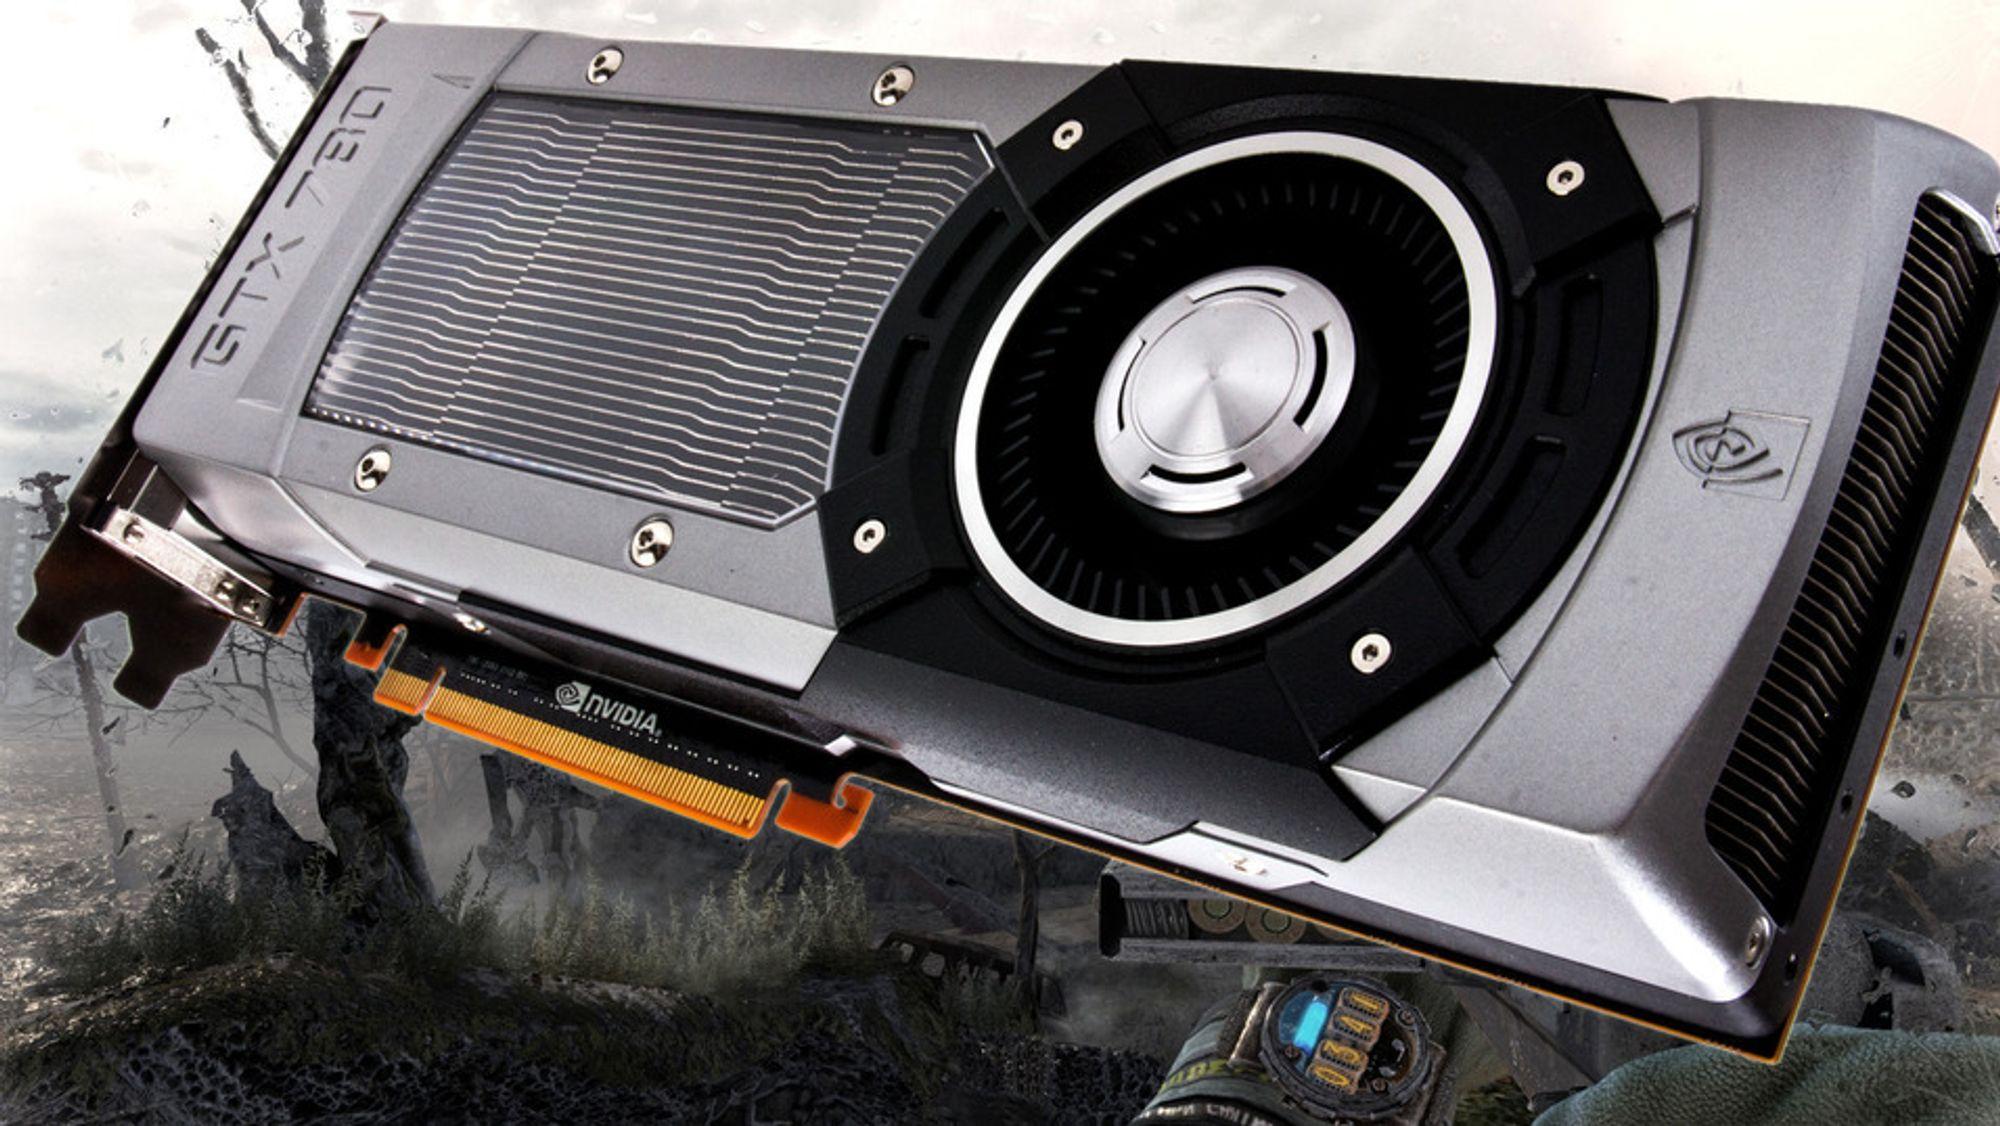 Bildet viser dagens GeForce GTX 780-kort.